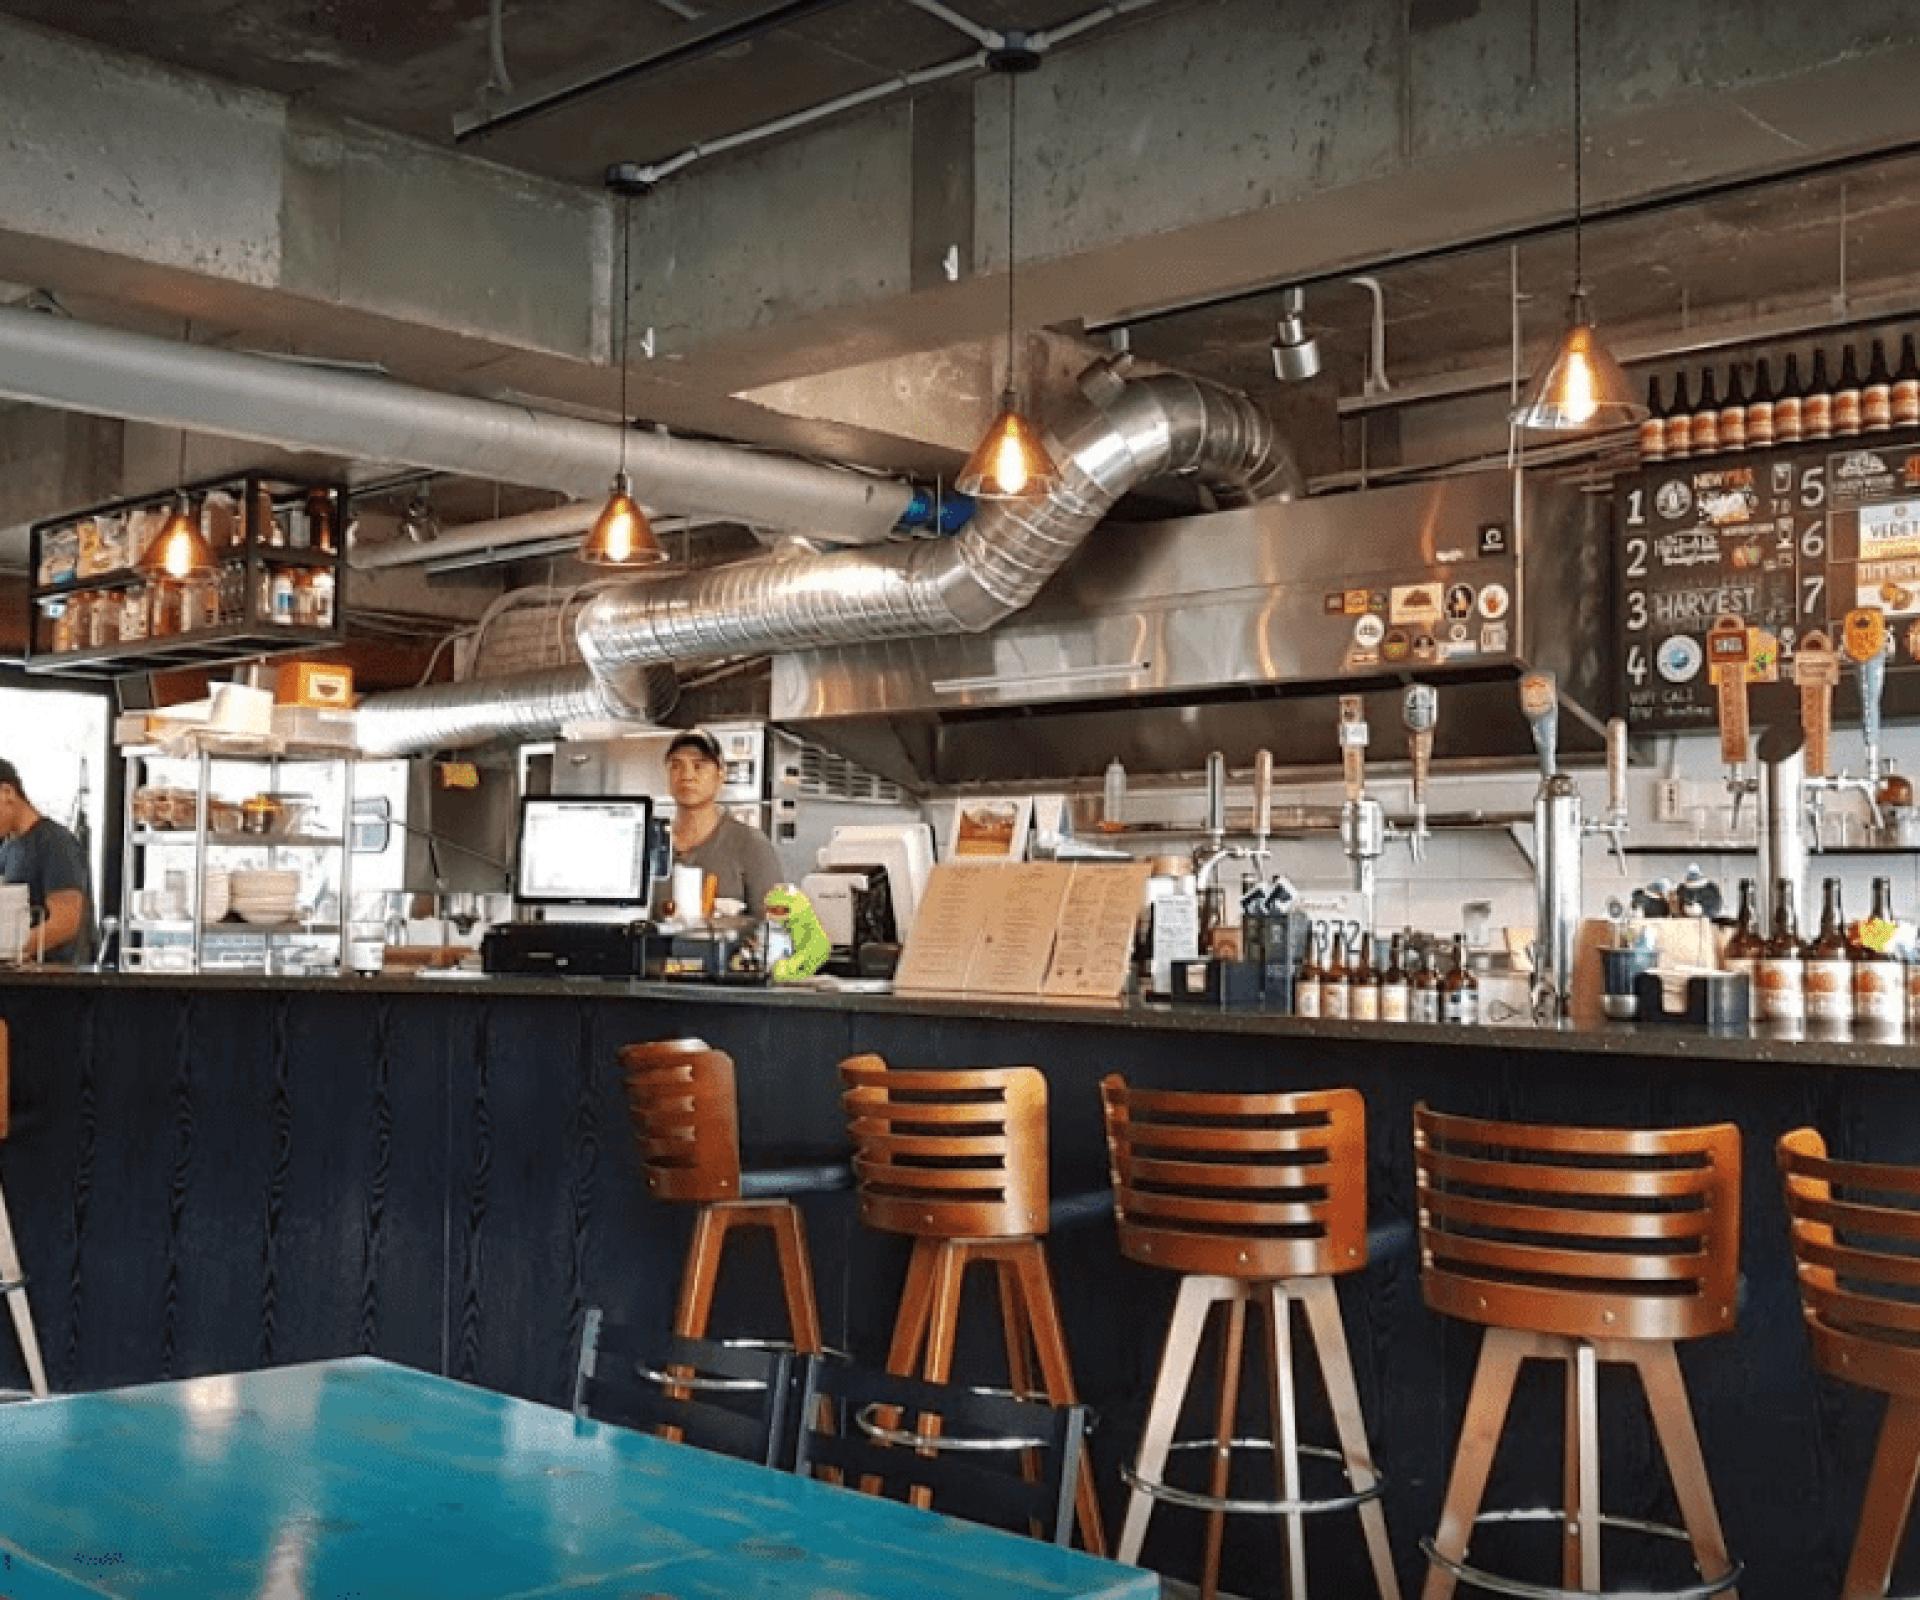 California Kitchen & Craft Pub | Yongsan-gu, Seoul